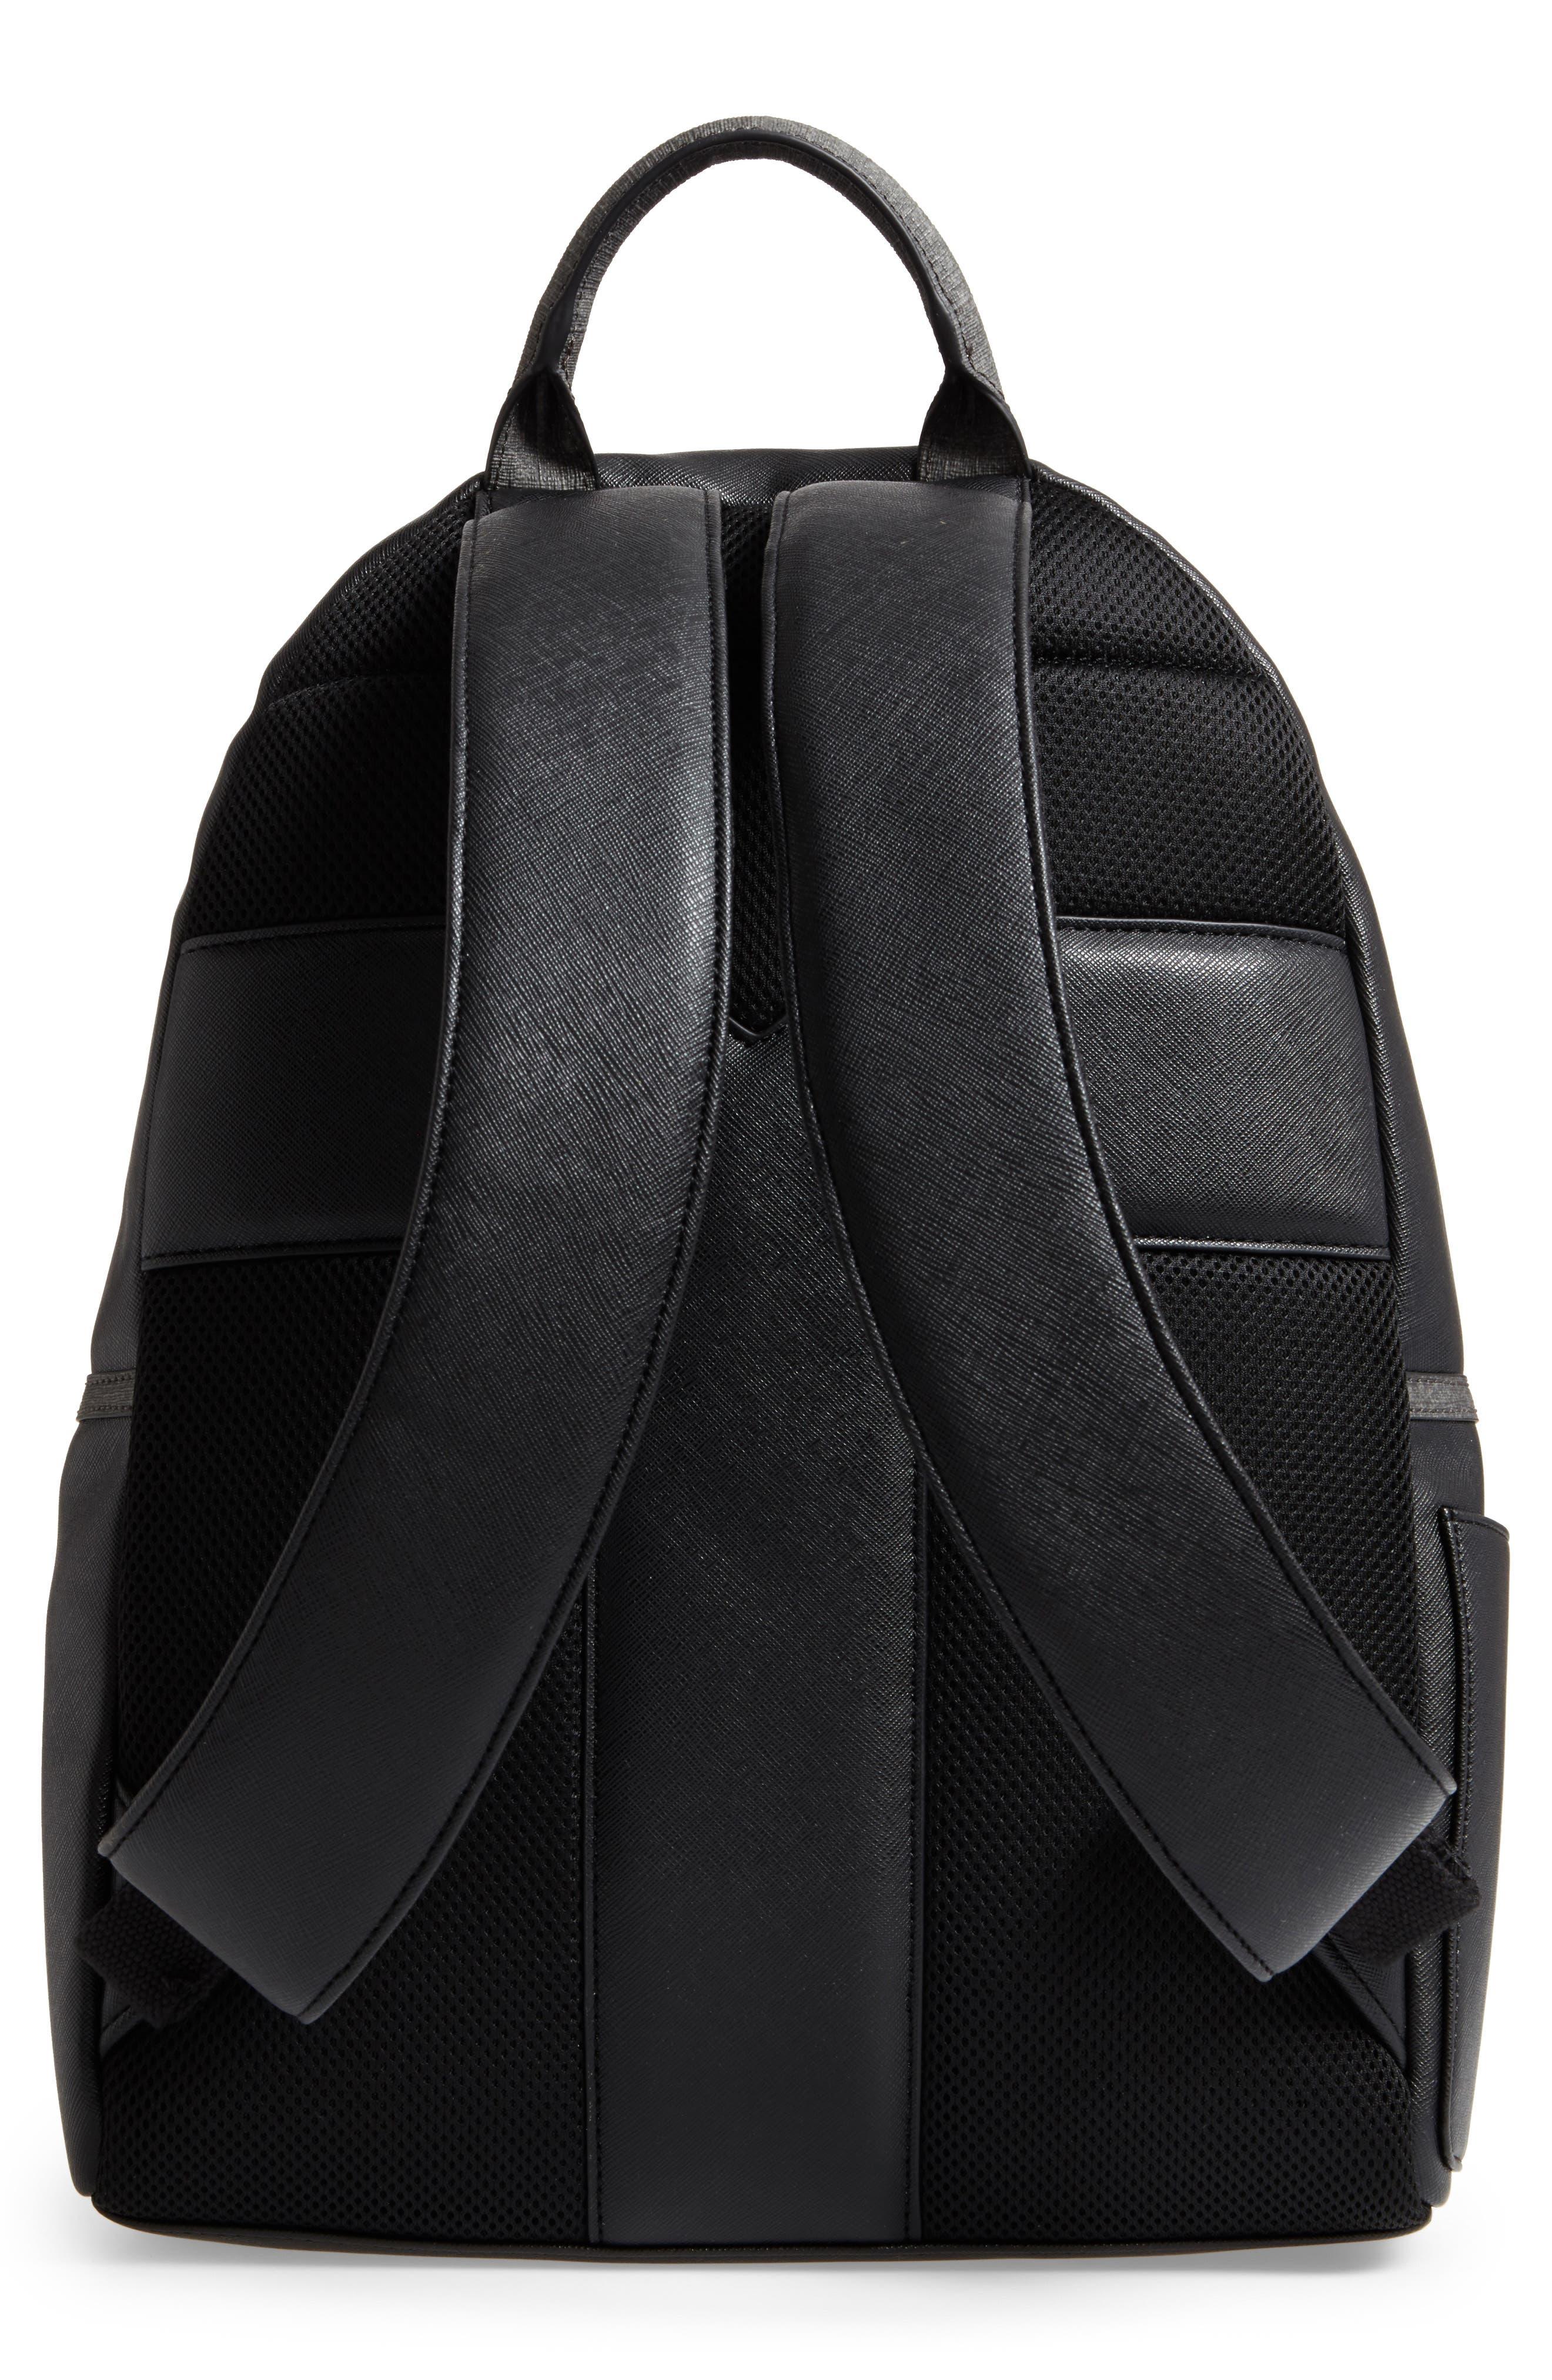 Fangs Backpack,                             Alternate thumbnail 3, color,                             Black